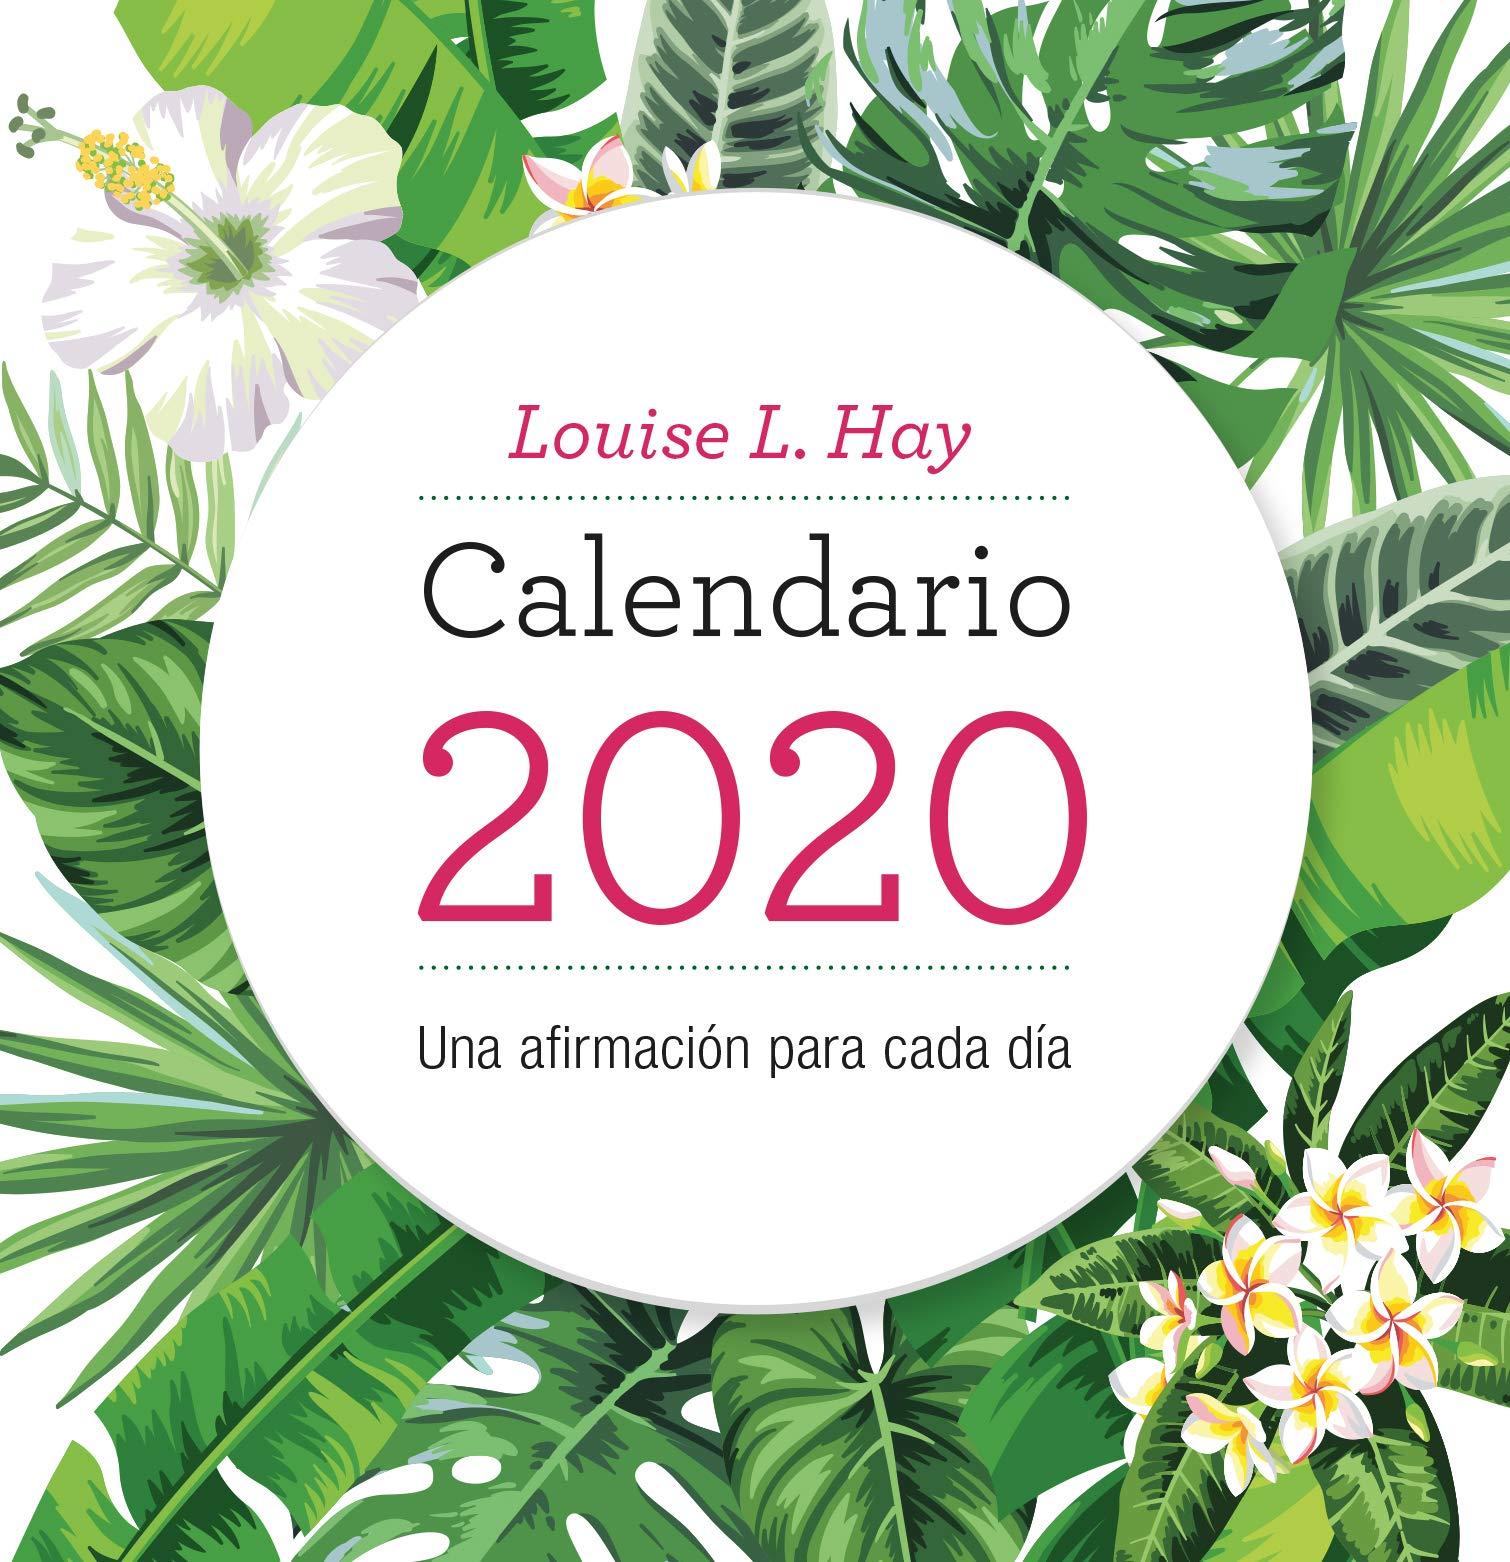 Amazon.com: Calendario Louise Hay 2020 (Spanish Edition ...